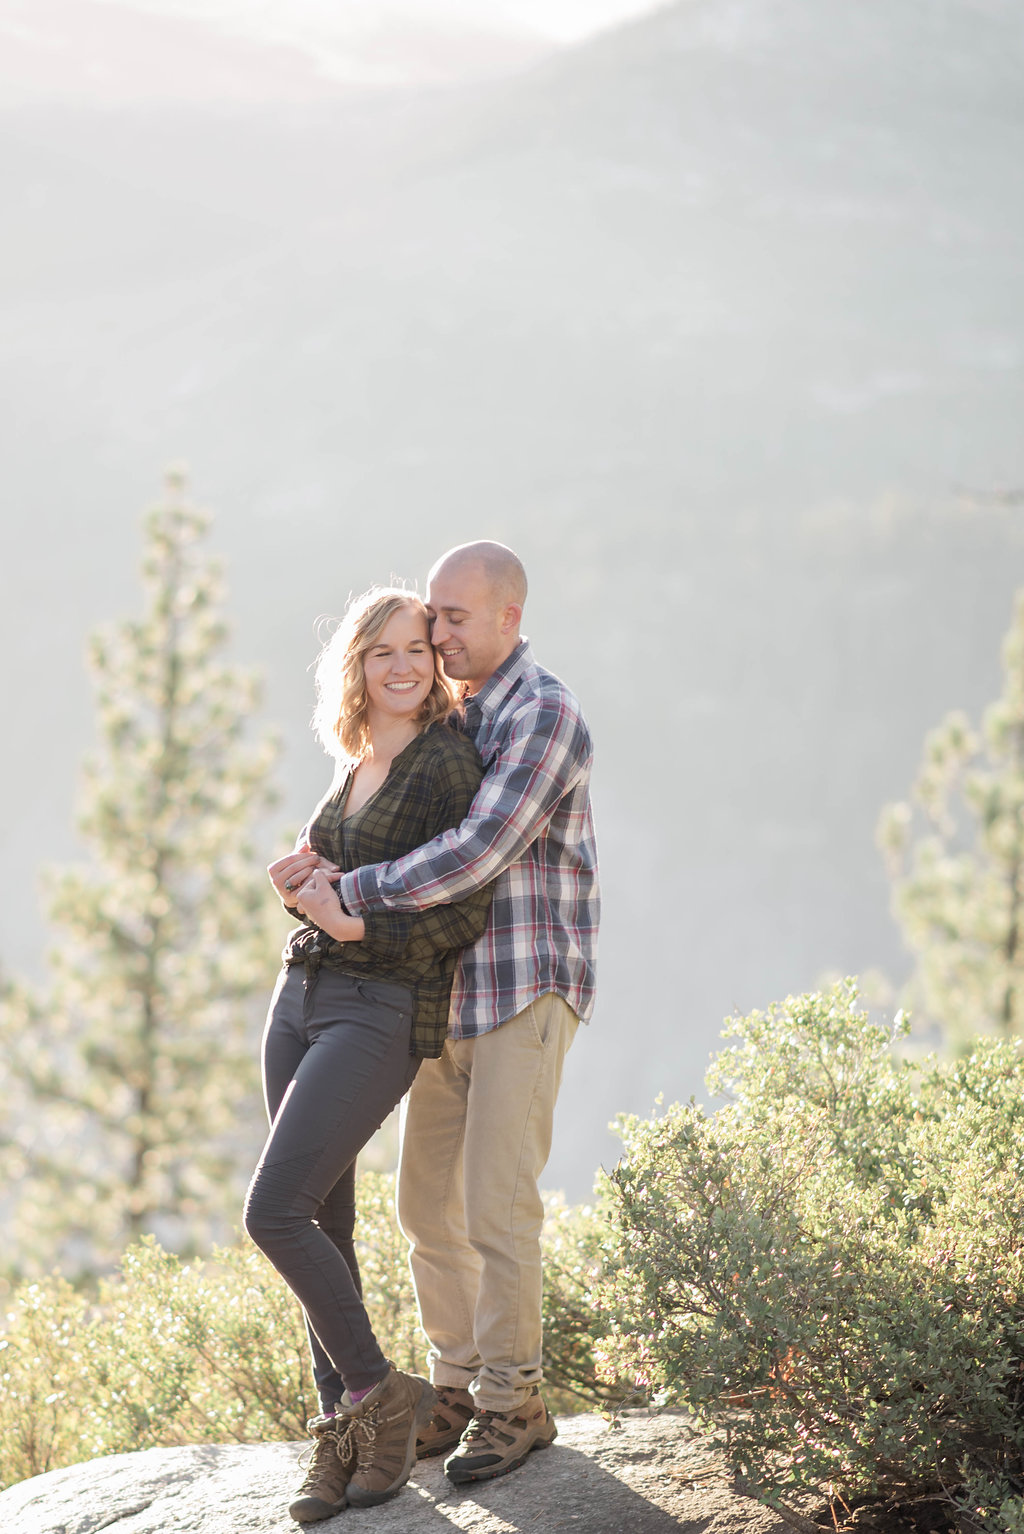 Yosemite Engagement Photos — The Overwhelmed Bride Wedding Blog